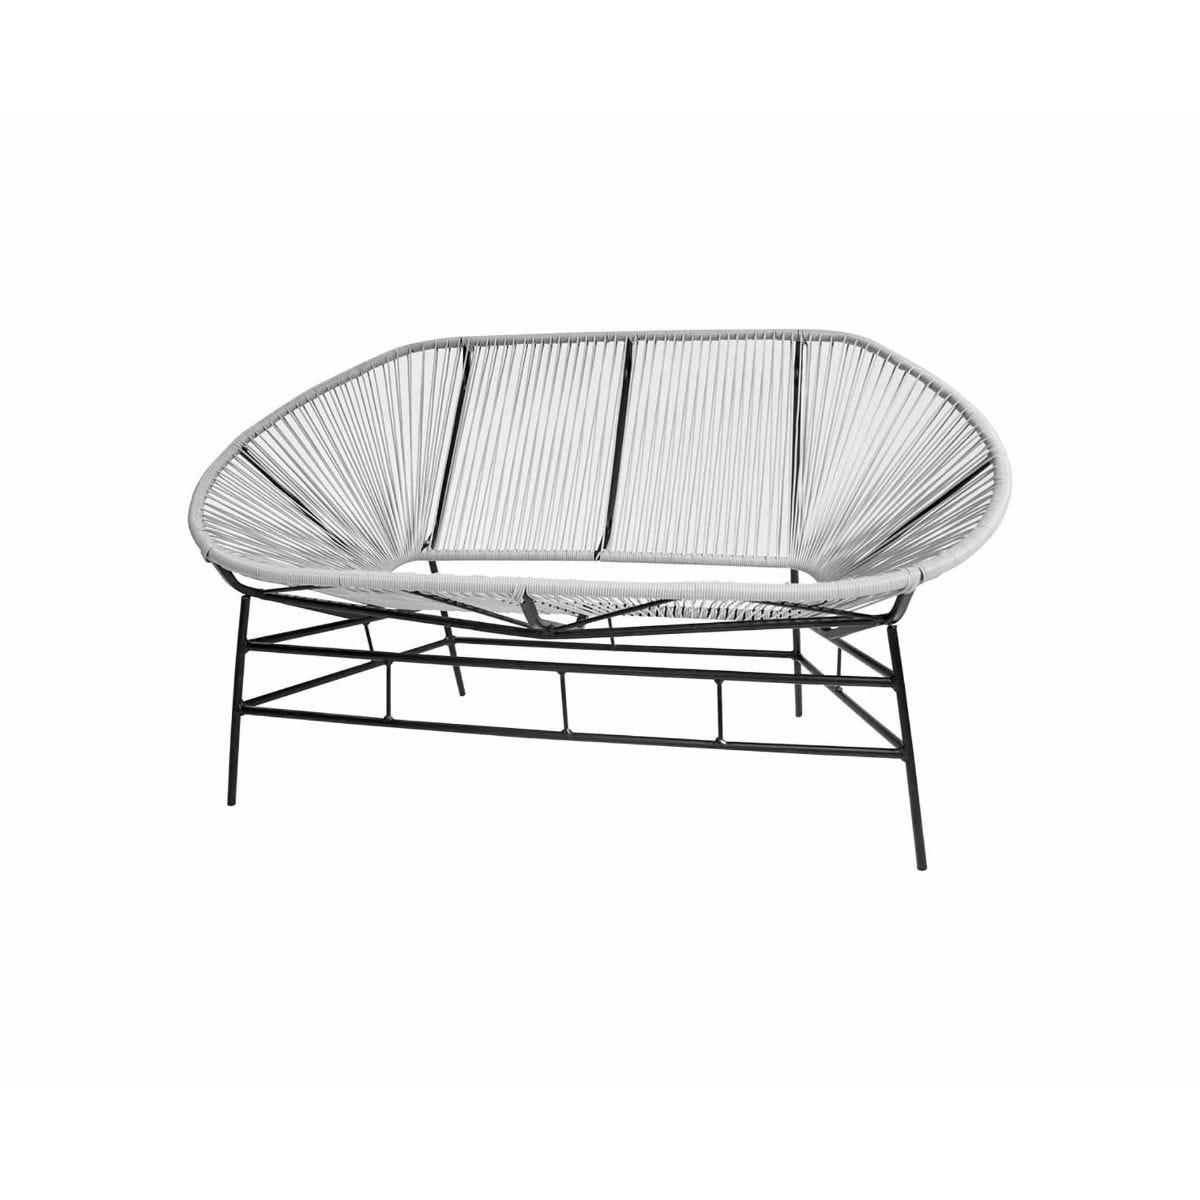 Charles Bentley Retro Rattan Garden Bench, Grey